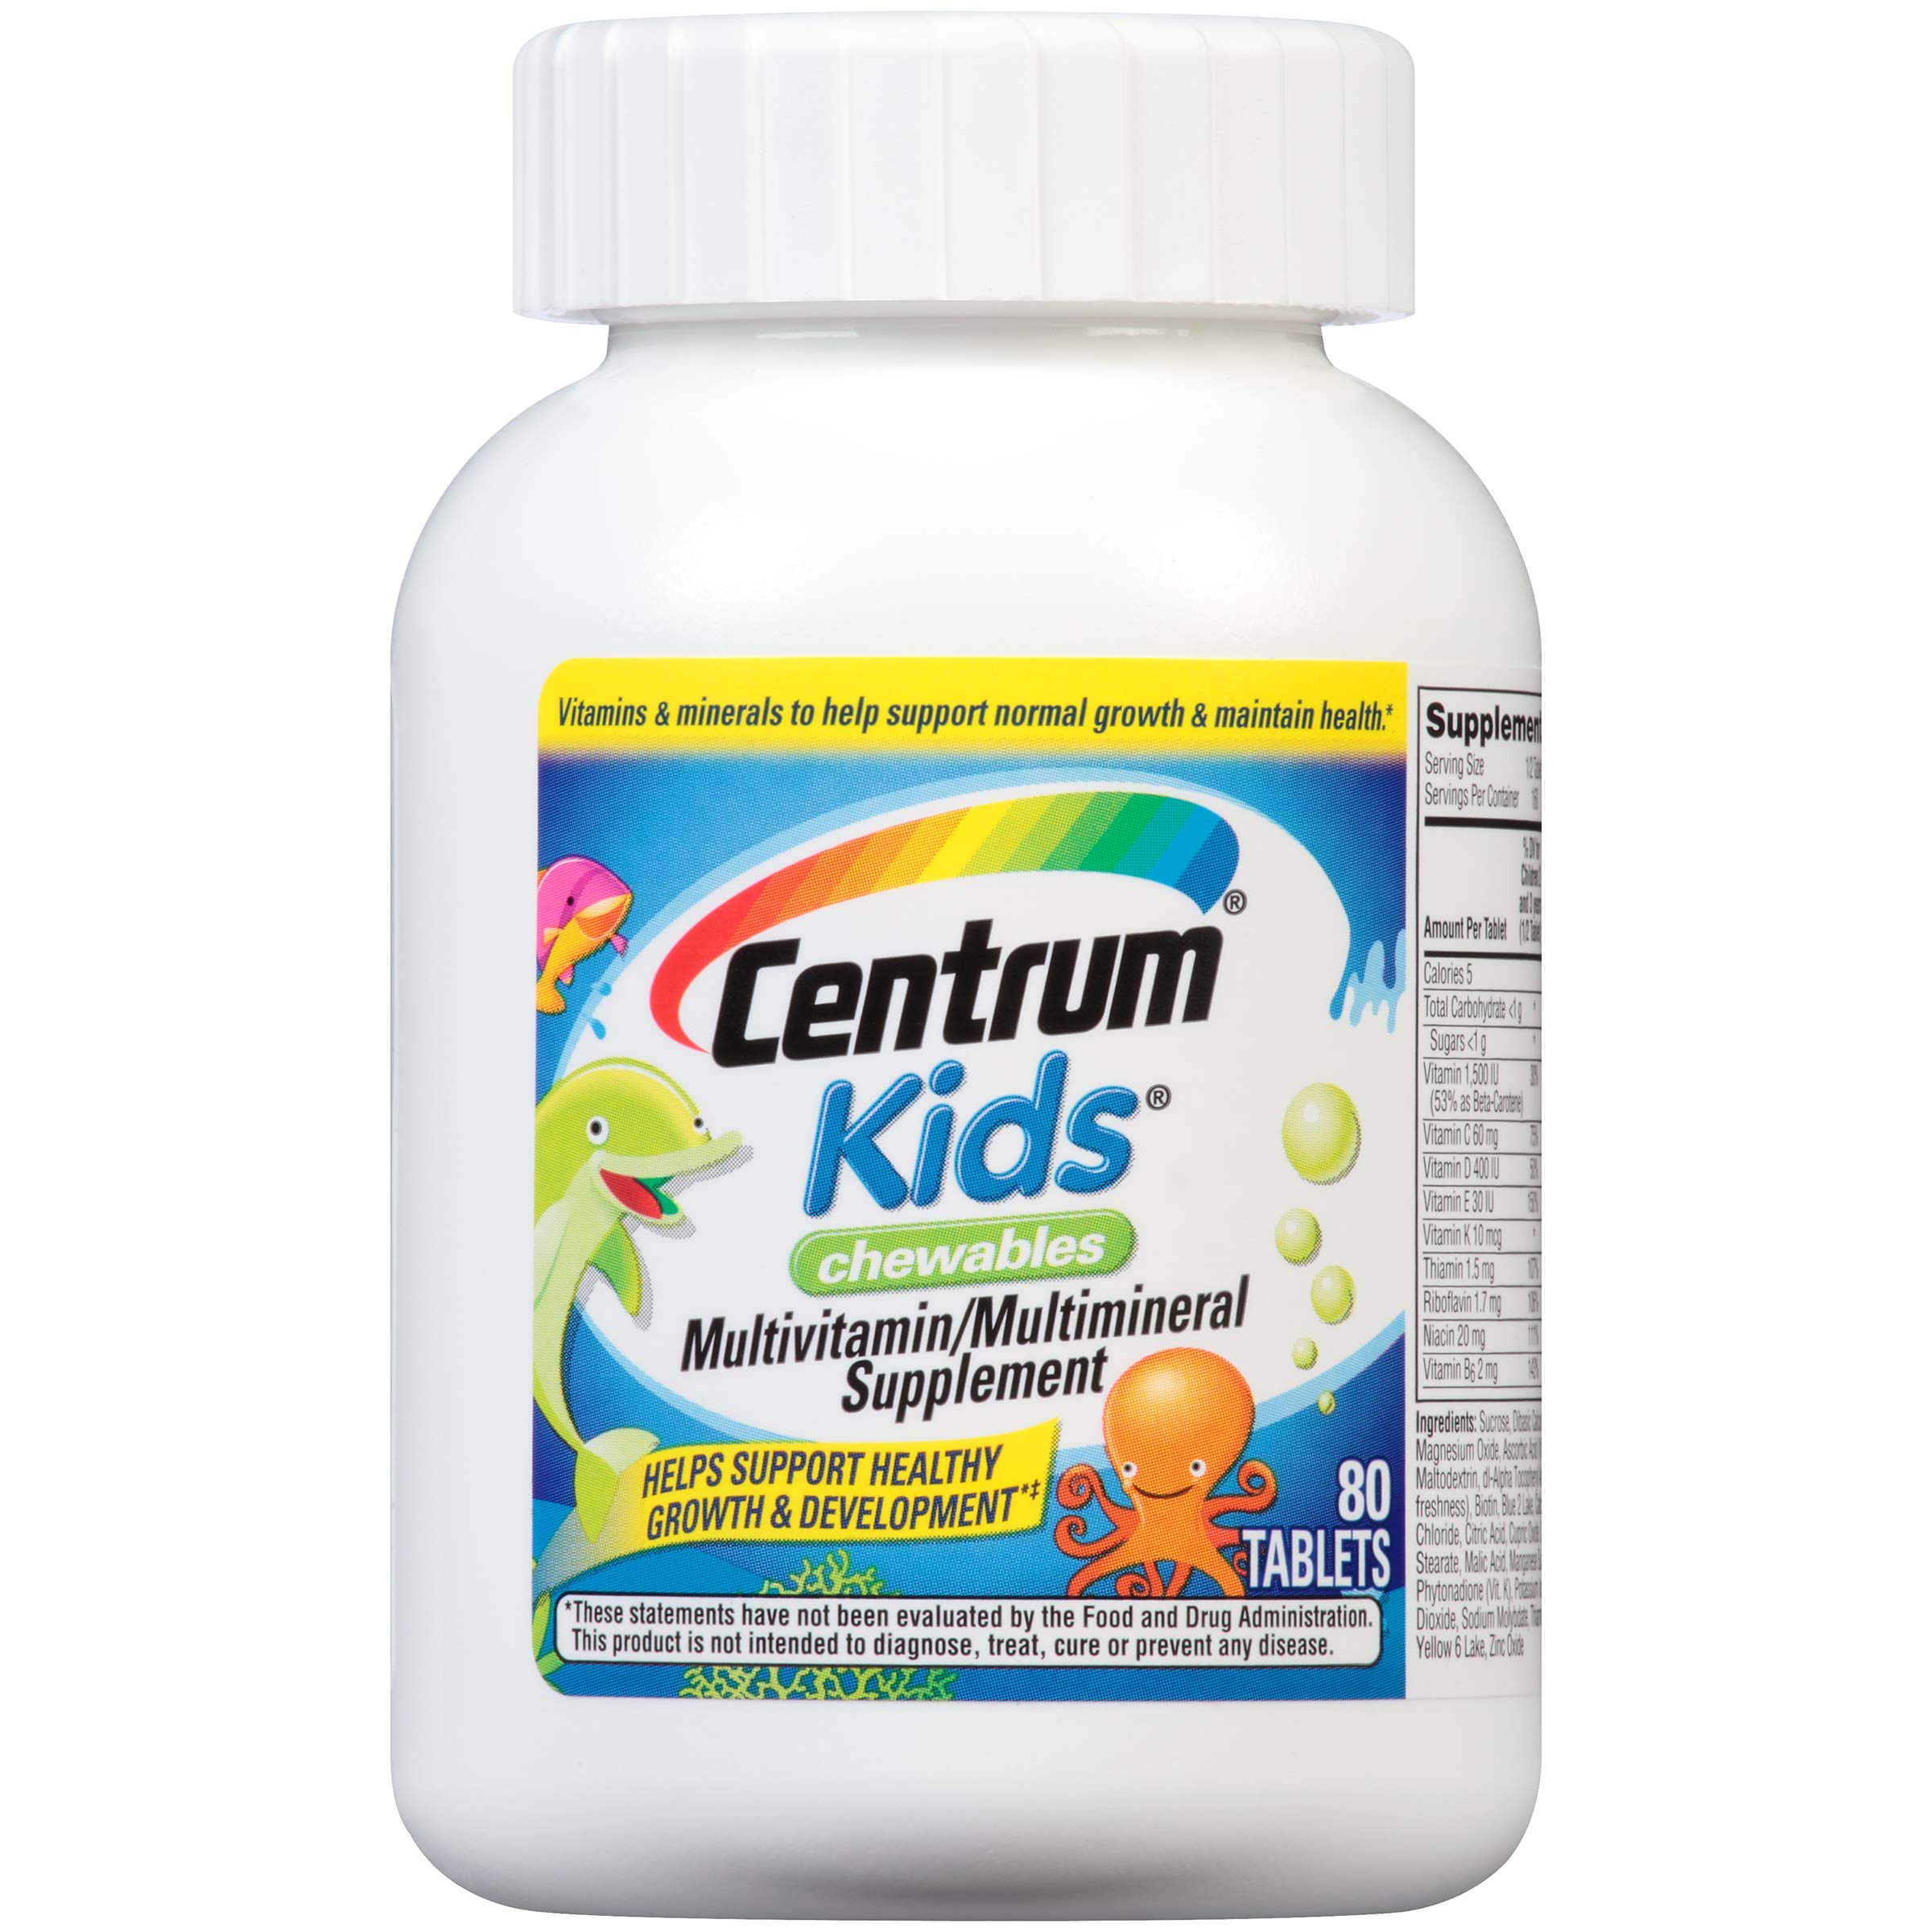 Centrum Chewables Multivitamin Multimineral Supplement